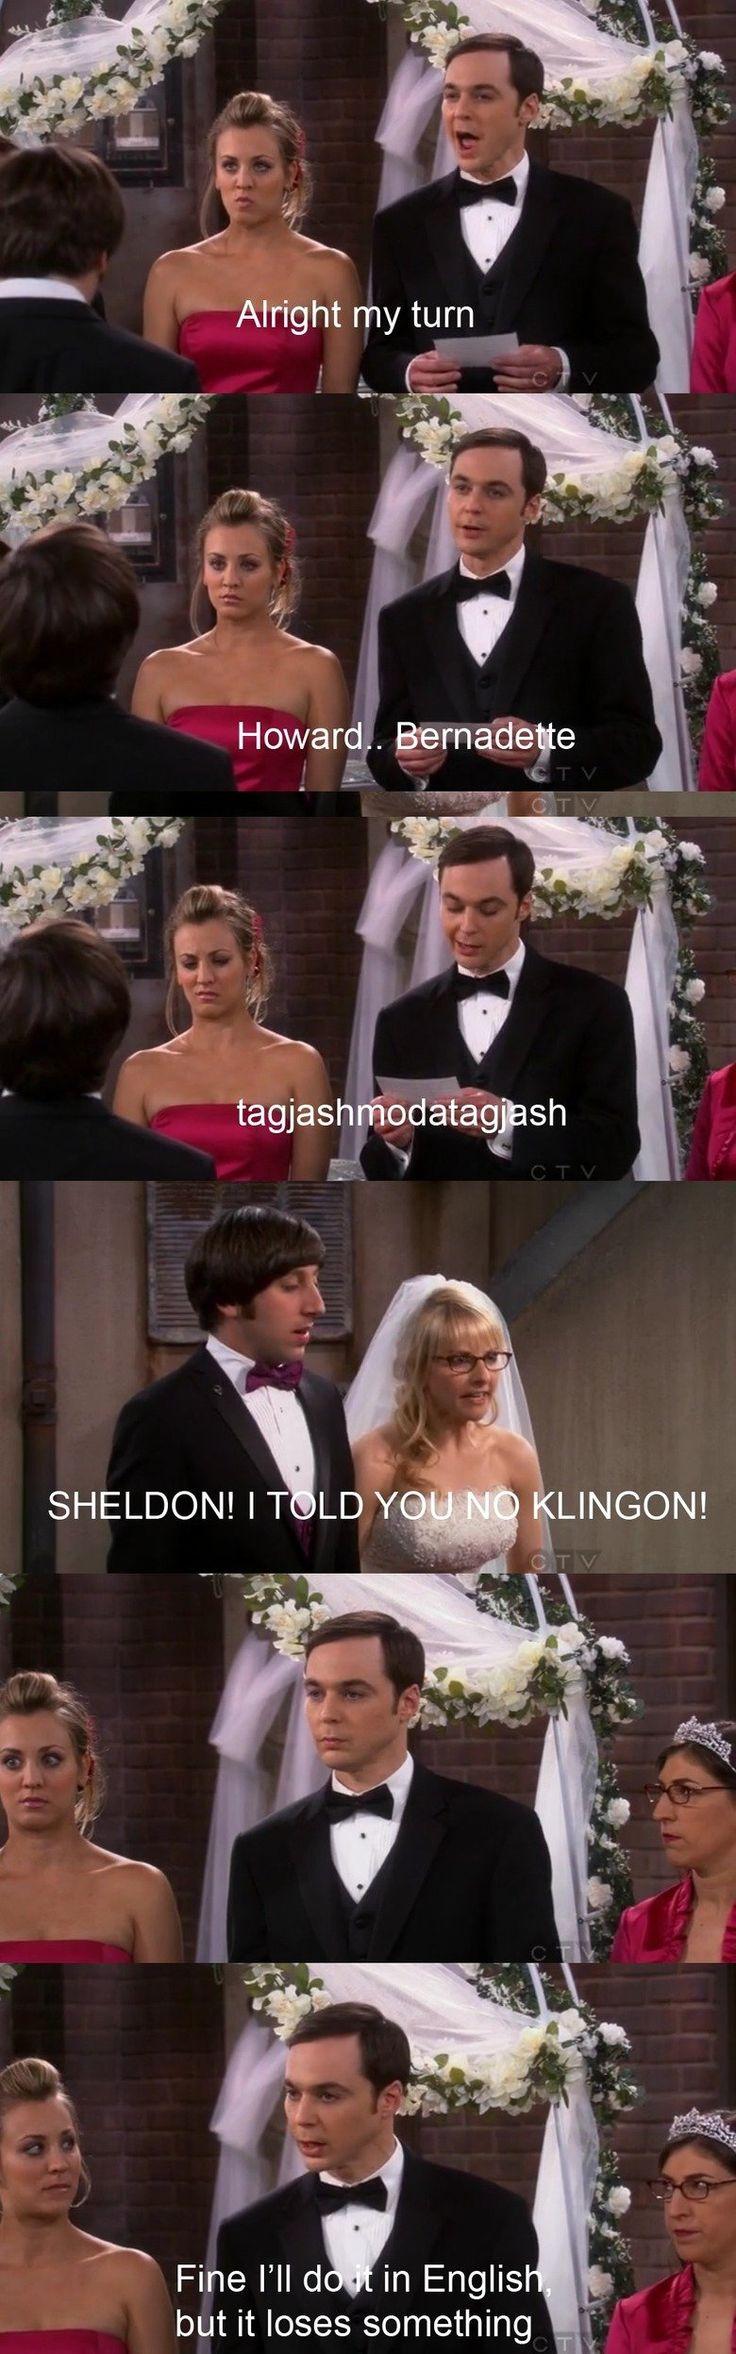 No Klingon! Hahahaha! This is why I love the Big Bang Theory (: